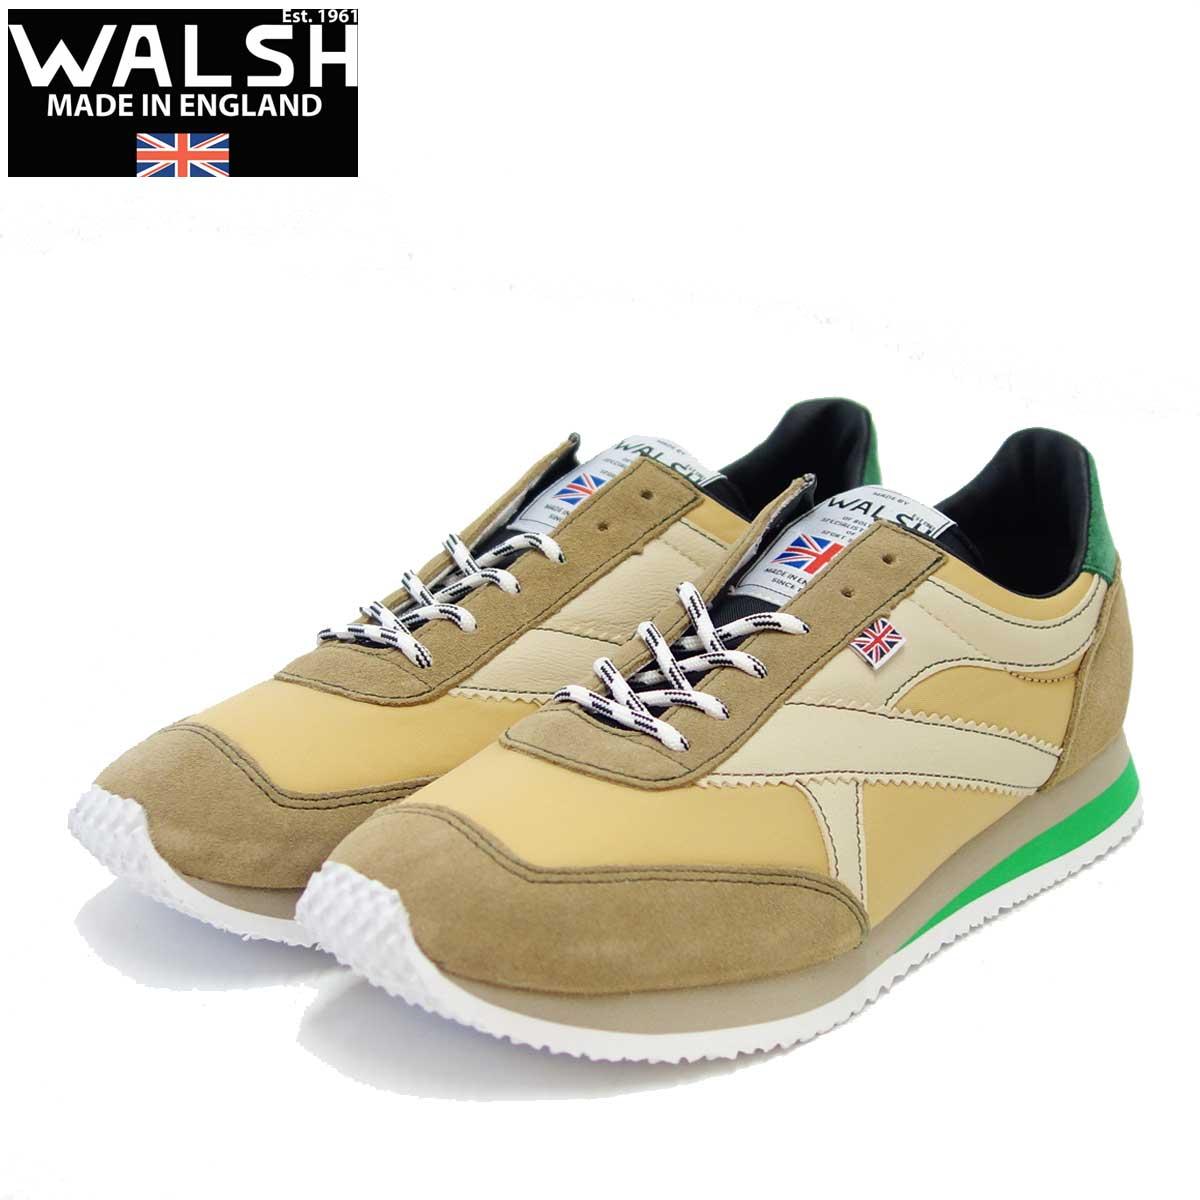 WALSH ウォルシュ TOR90201(ユニセックス) Tornado カラー:ベージュ/グリーン(英国製) スエード&ナイロンのランニングスニーカー 「靴」